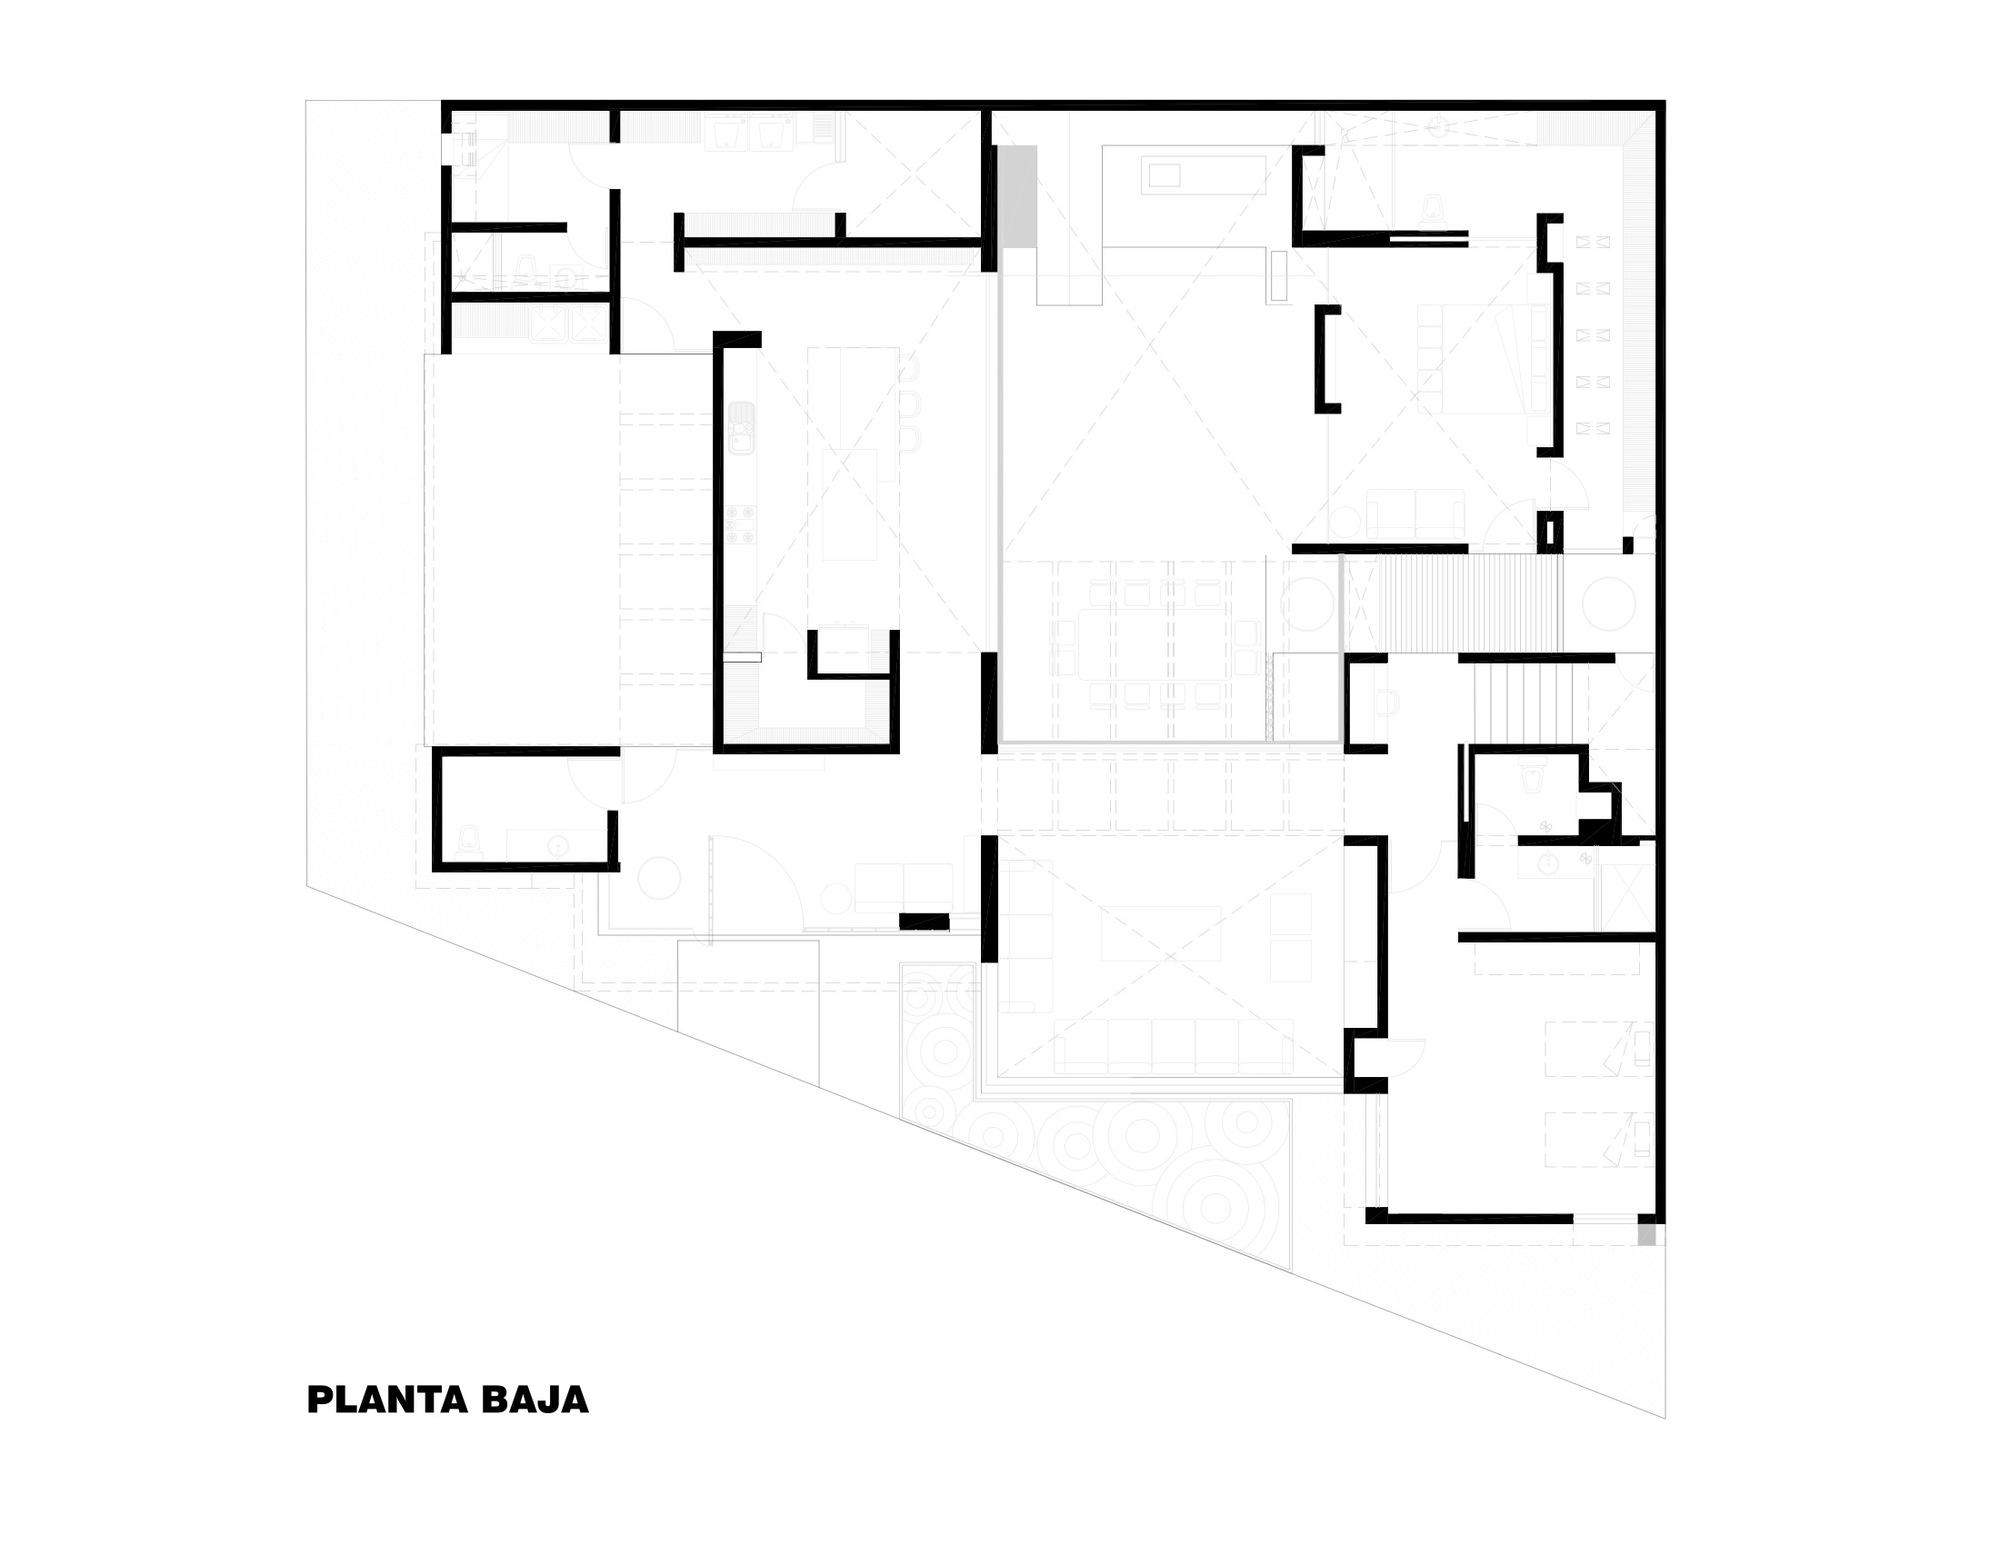 Galer a de casa agr adi arquitectura y dise o interior 22 for Arquitectura y diseno interior